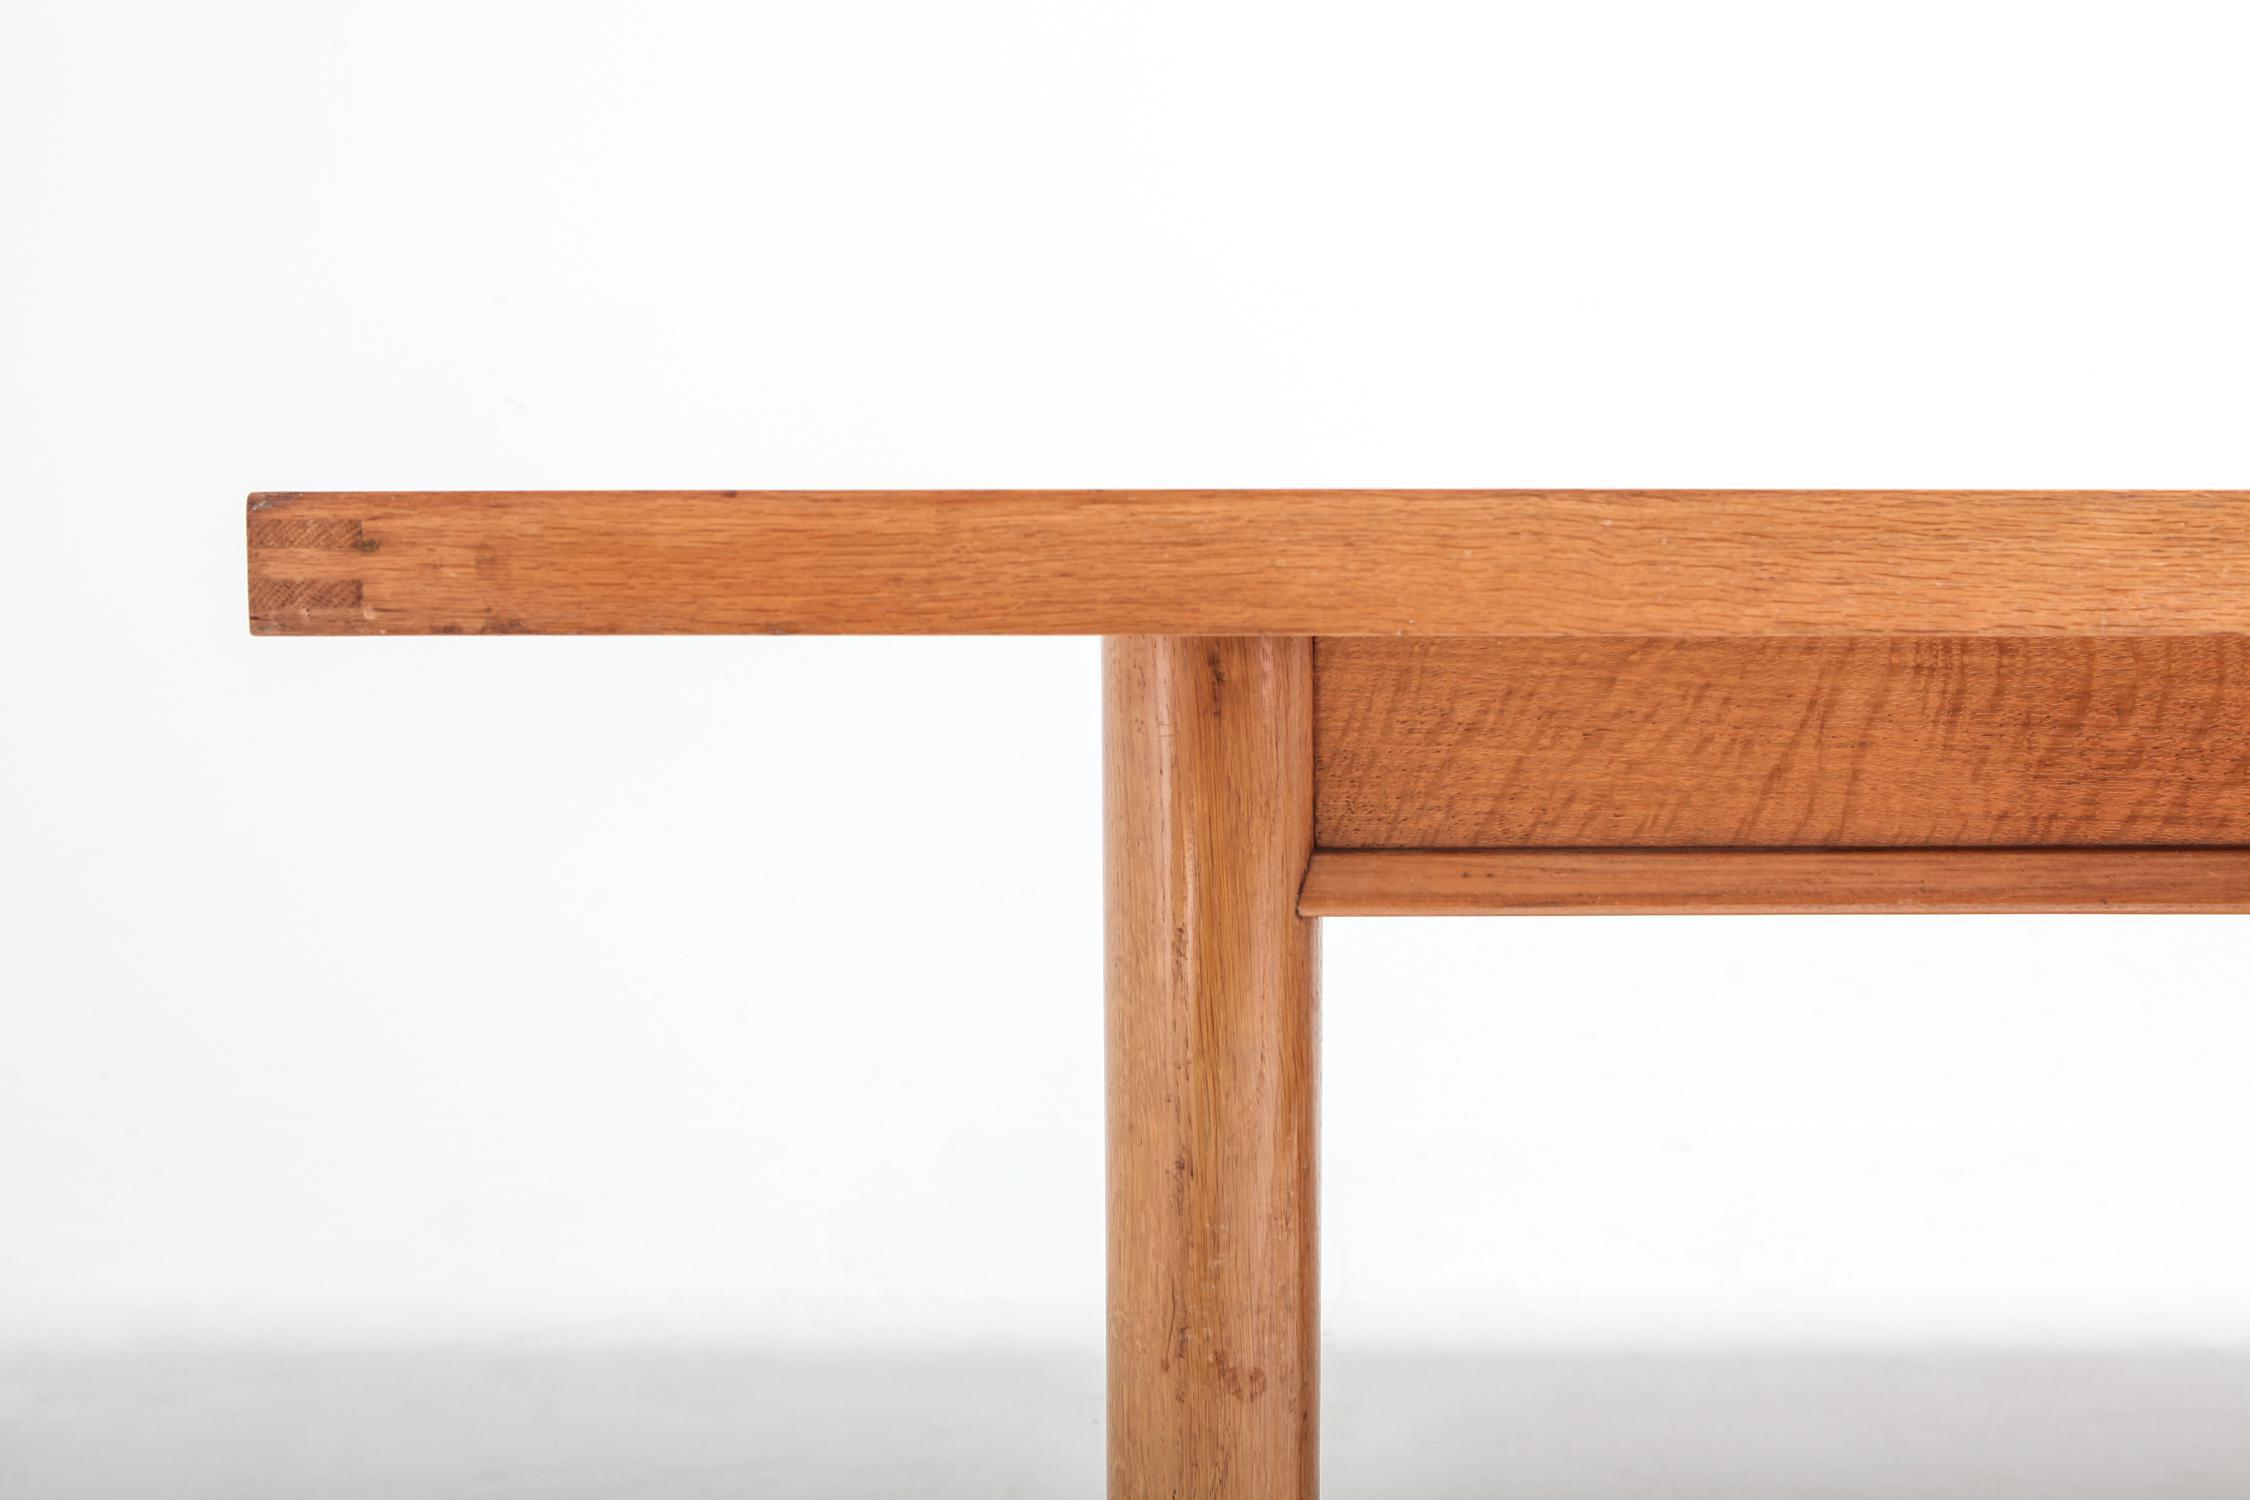 Oak American Modern Oak Dining Table By Robsjohn Gibbings For Sale   Image  7 Of 9